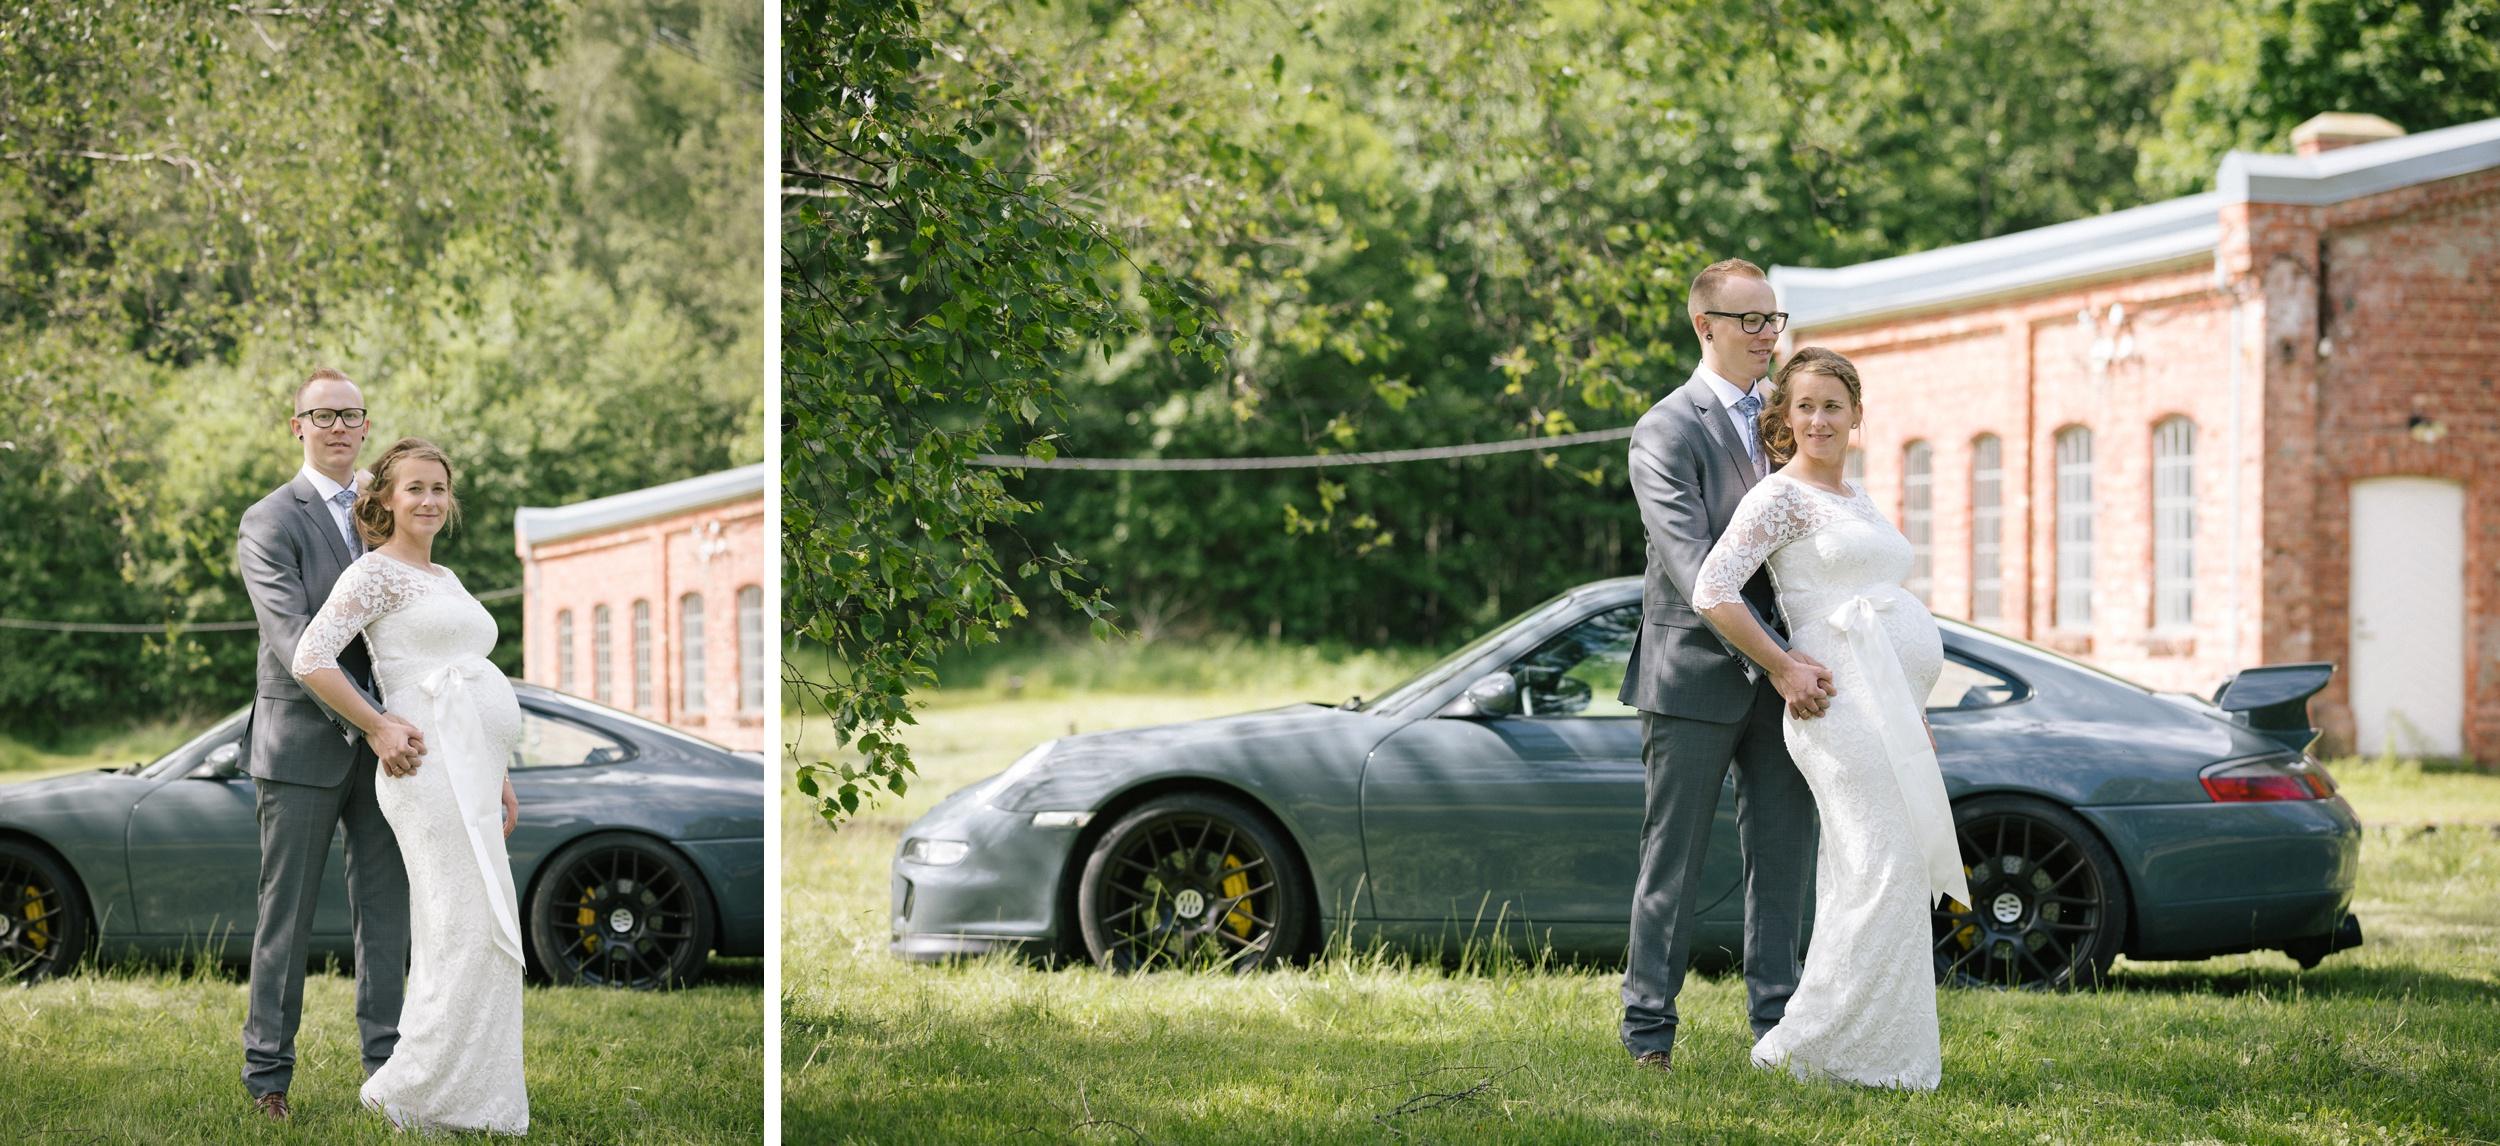 bryllup-bryllupsfotografering-bryllupsfotograf-sarpsborg-20170617-_H2A2908anneli_phillip_WEB.jpg